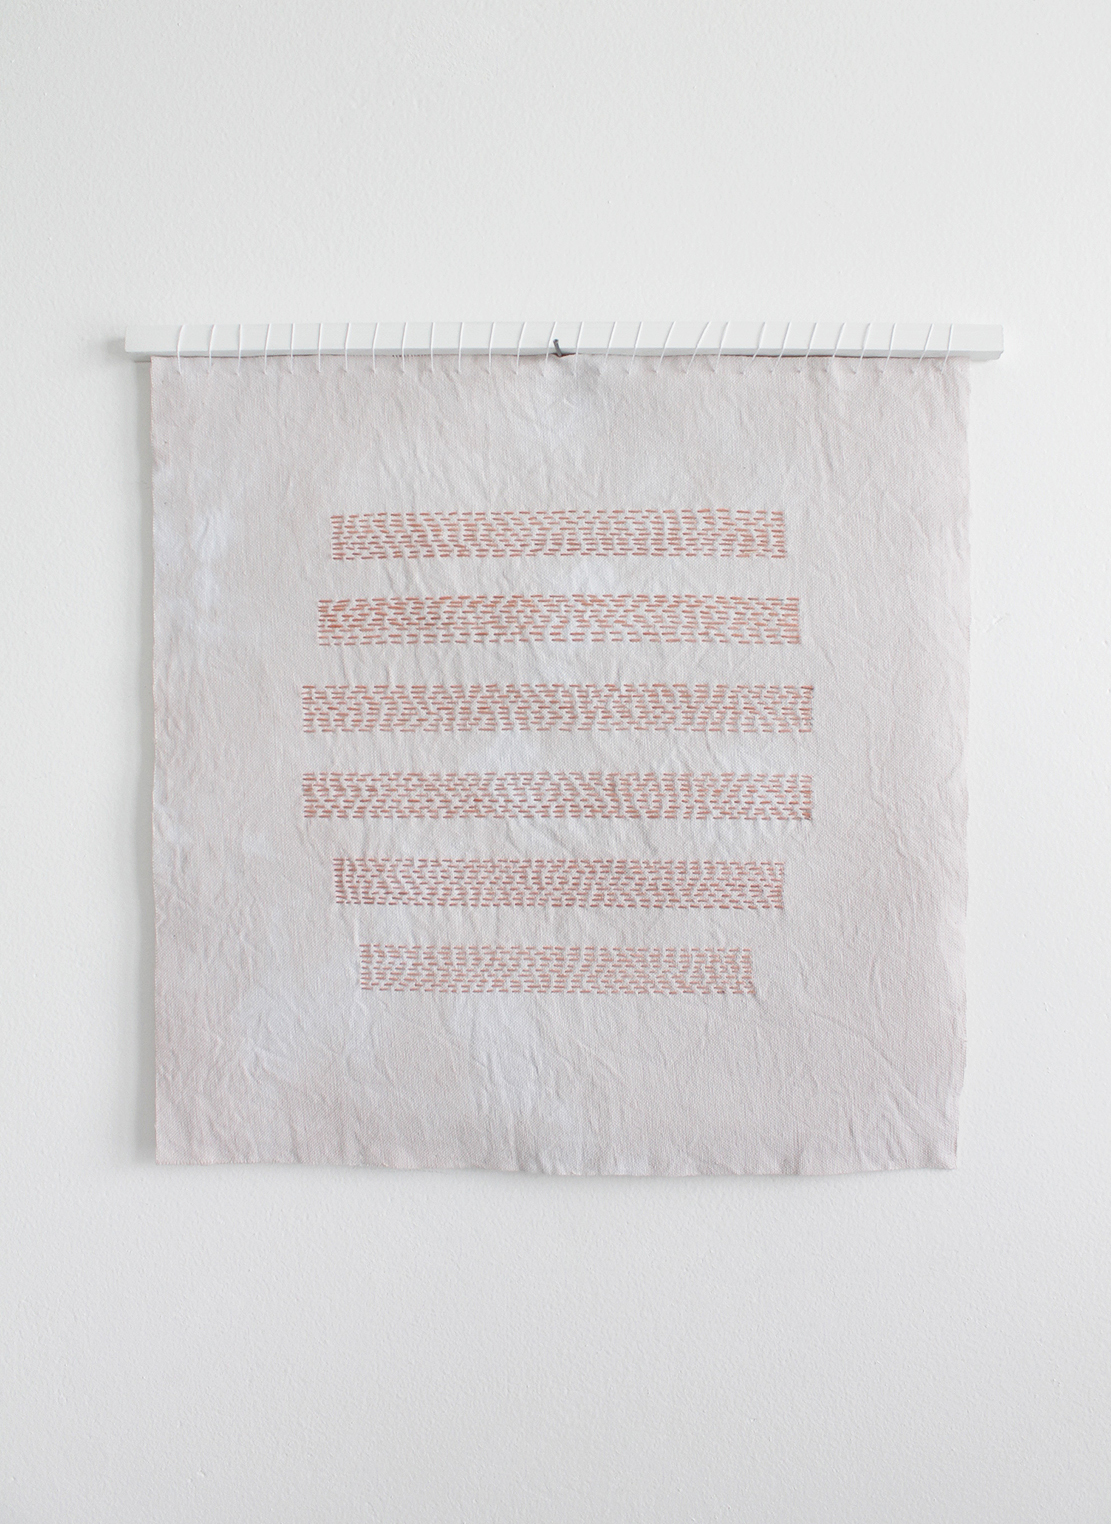 Self Portrait Breasts in Stripes